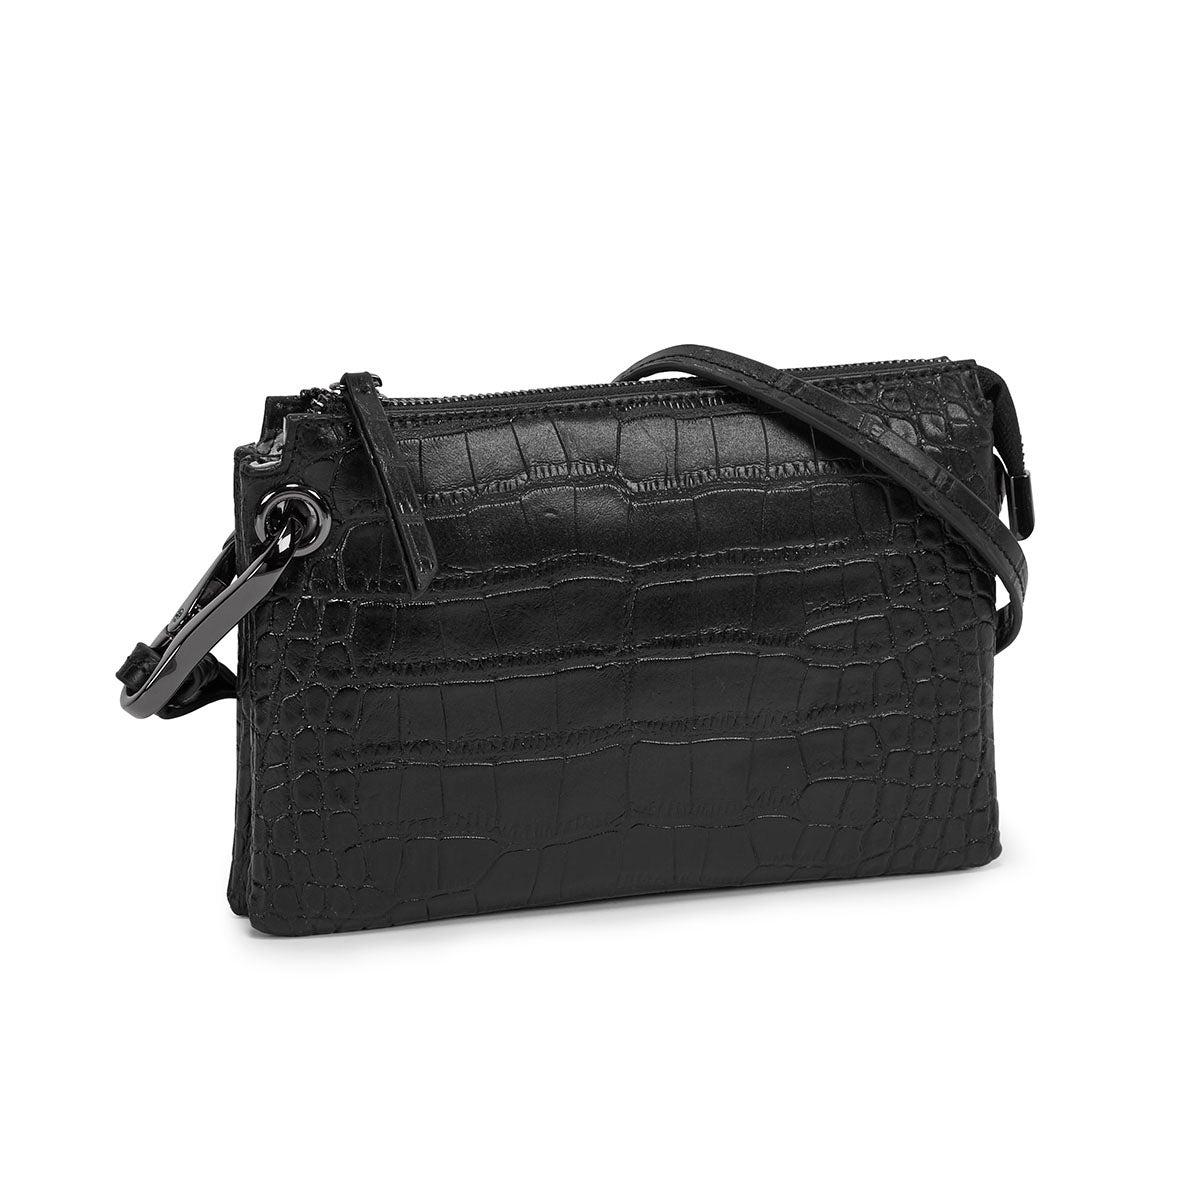 Women's 5380 black mini cross body bag